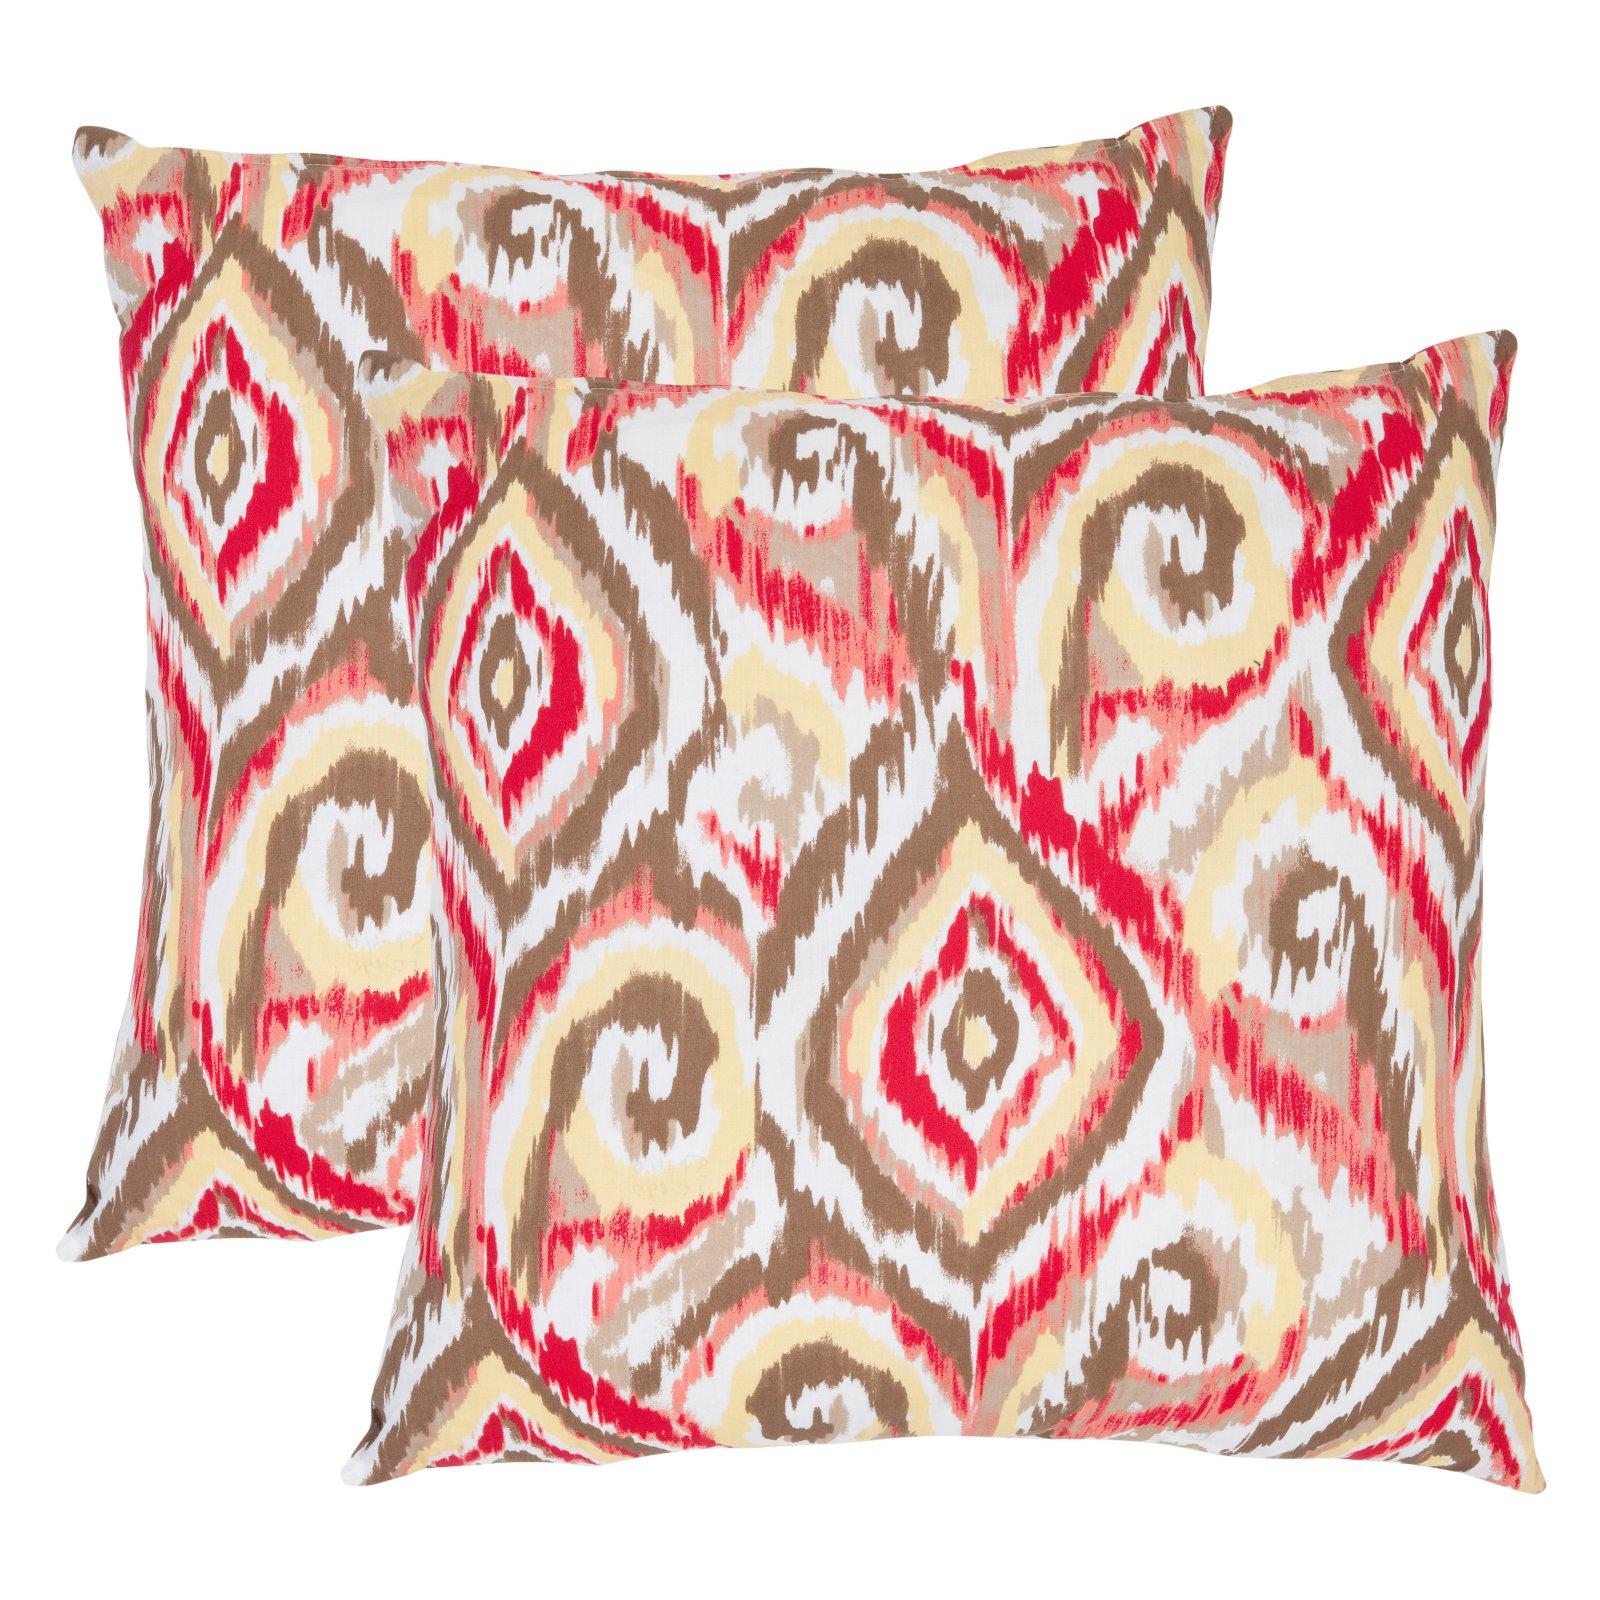 Safavieh Joyce Brown/White Decorative Pillows - Set of 2